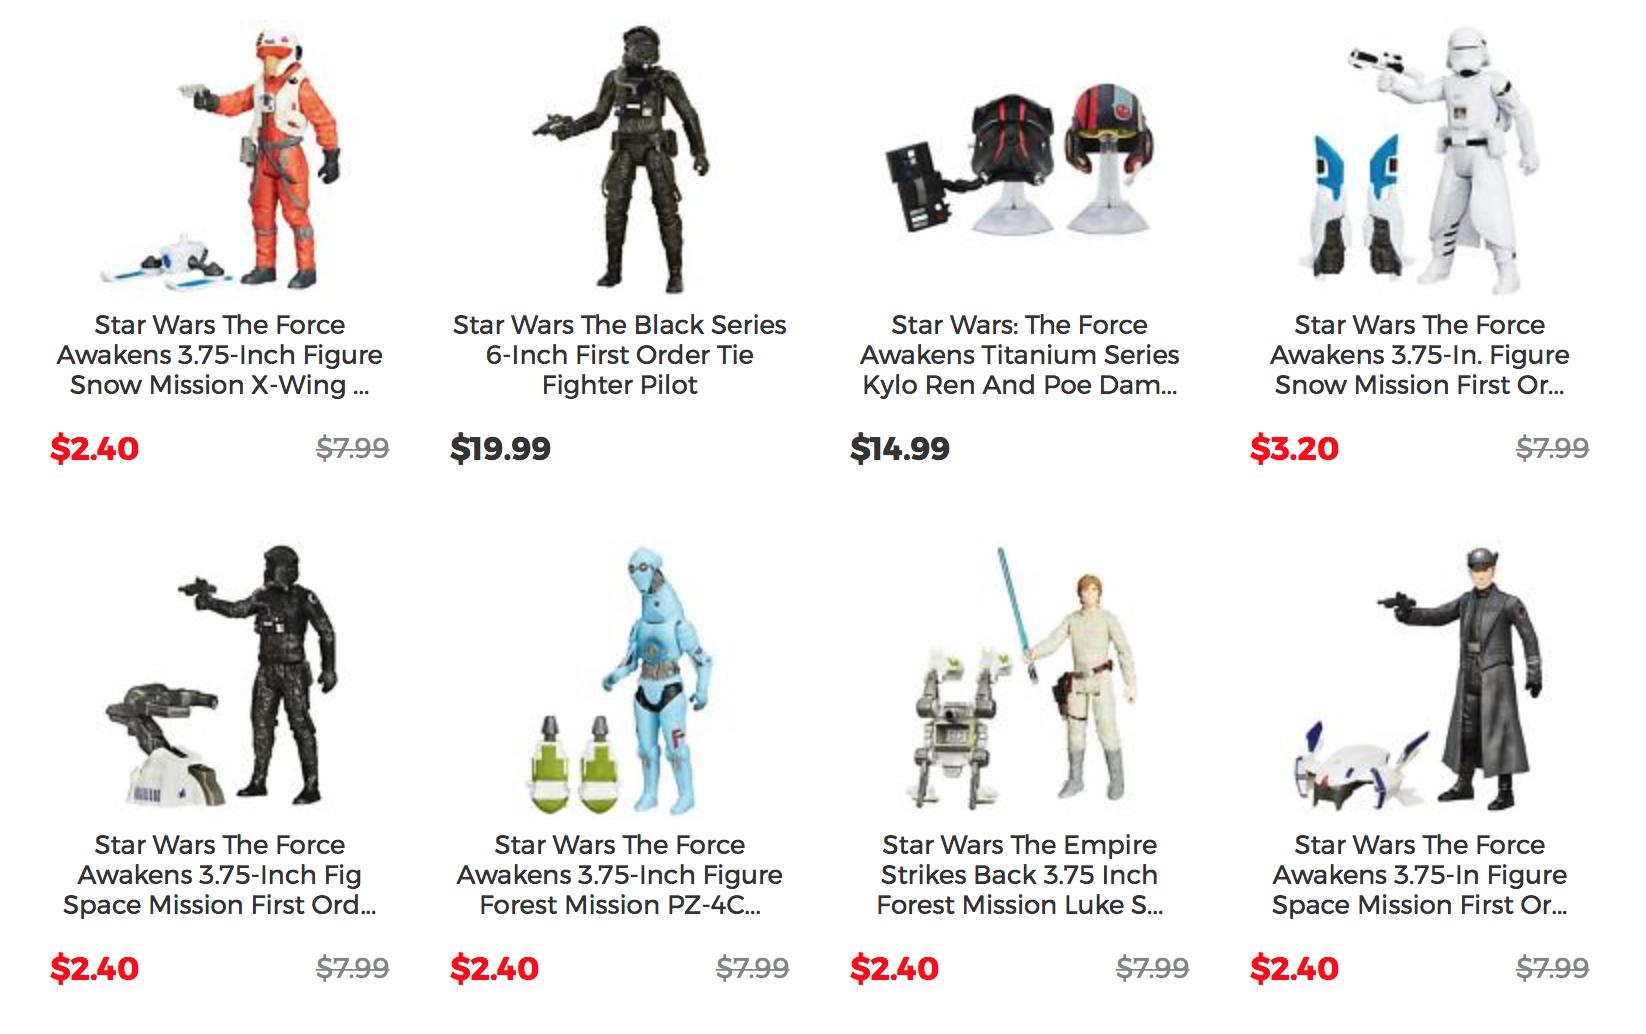 HasbroToyShop eBay Store 50% Off & Up On Star Wars Action Figures